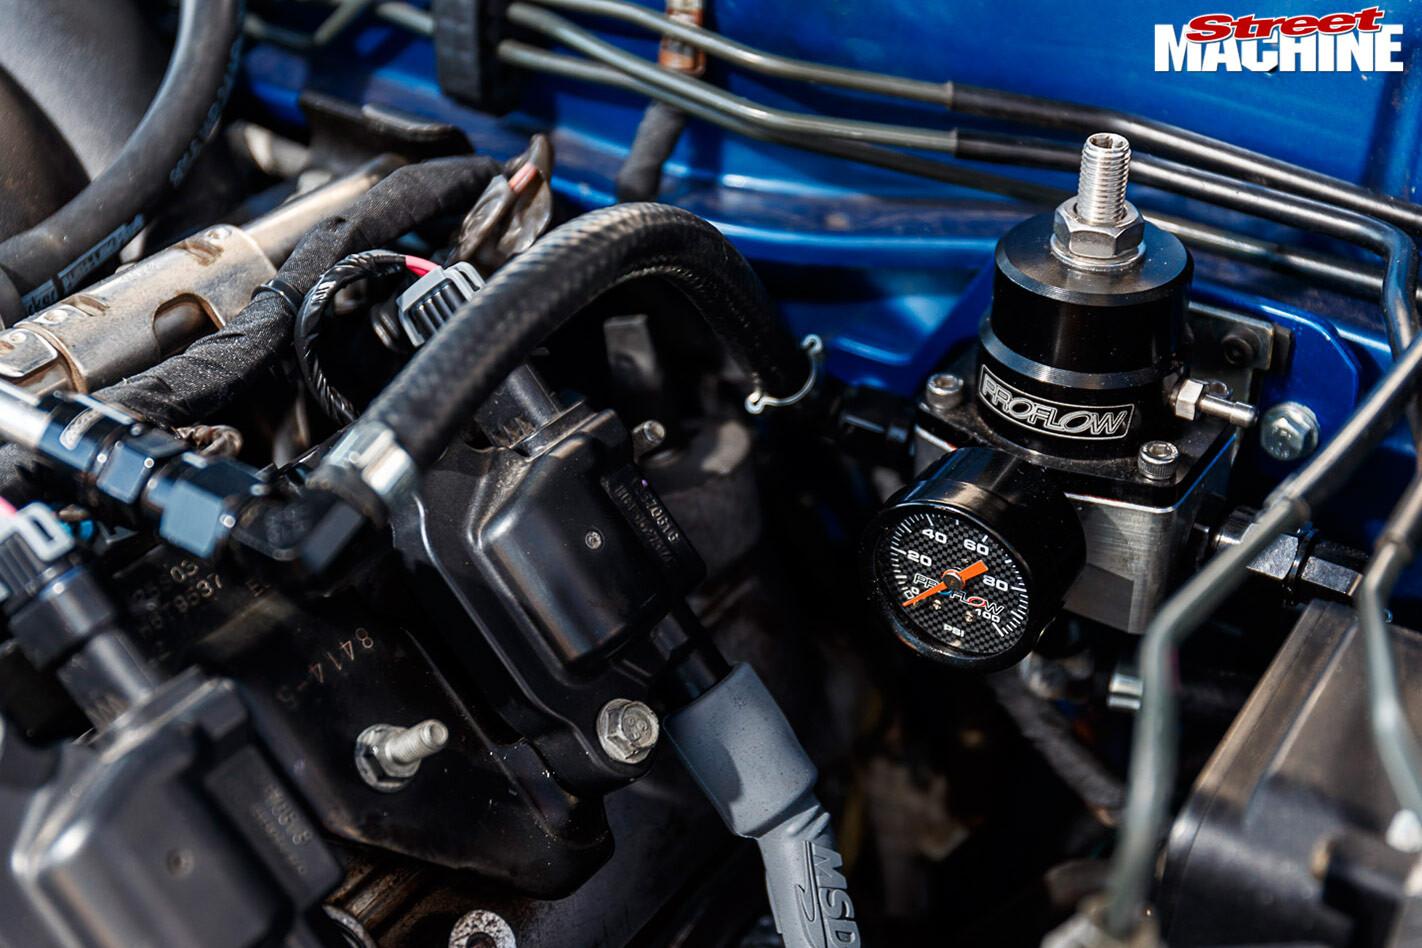 Mazda RX7 engine bay